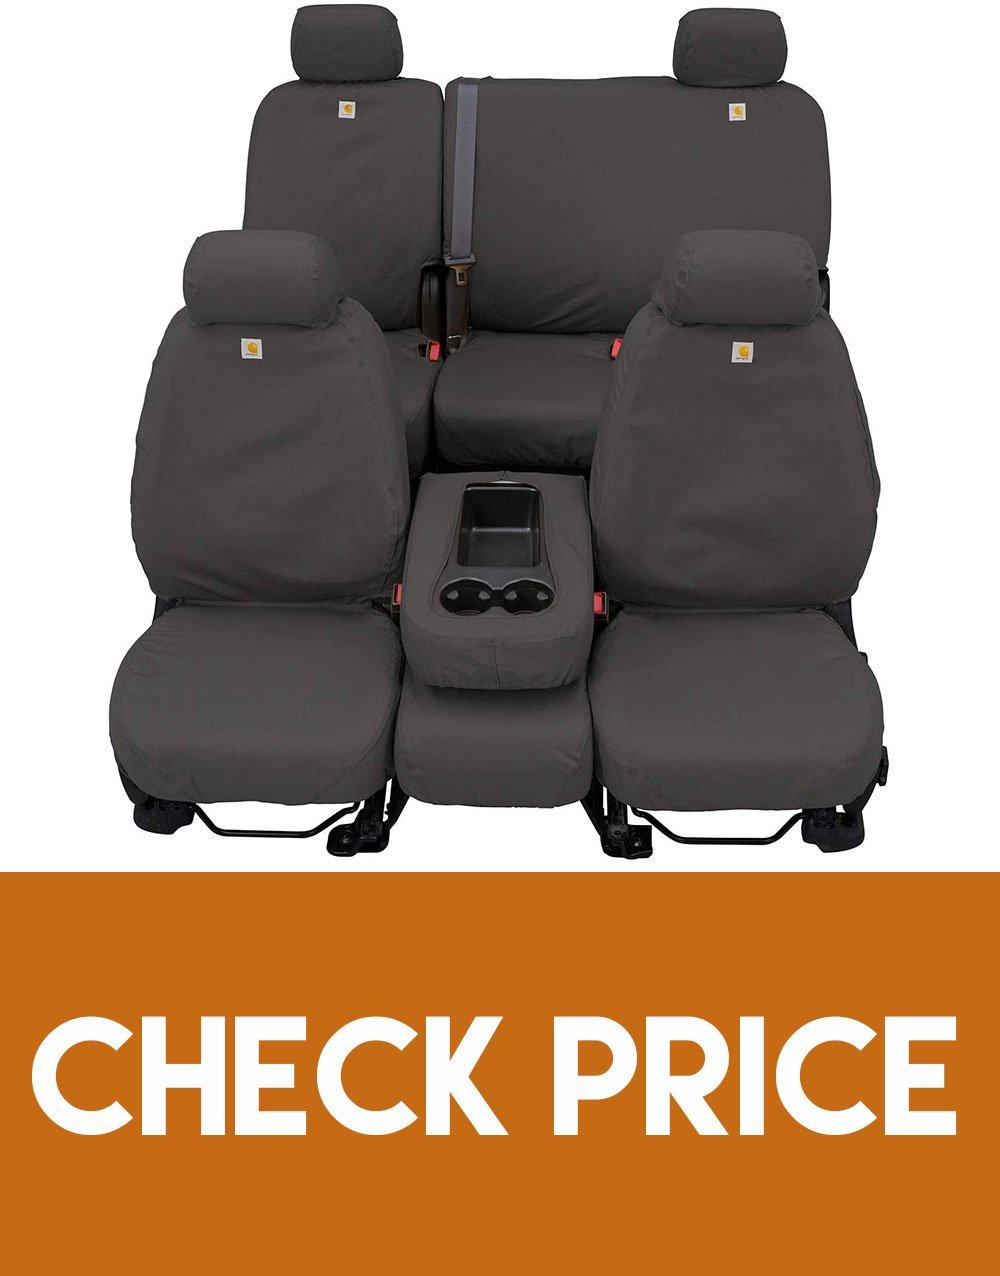 Covercraft Carhartt SeatSaver Seat Cover